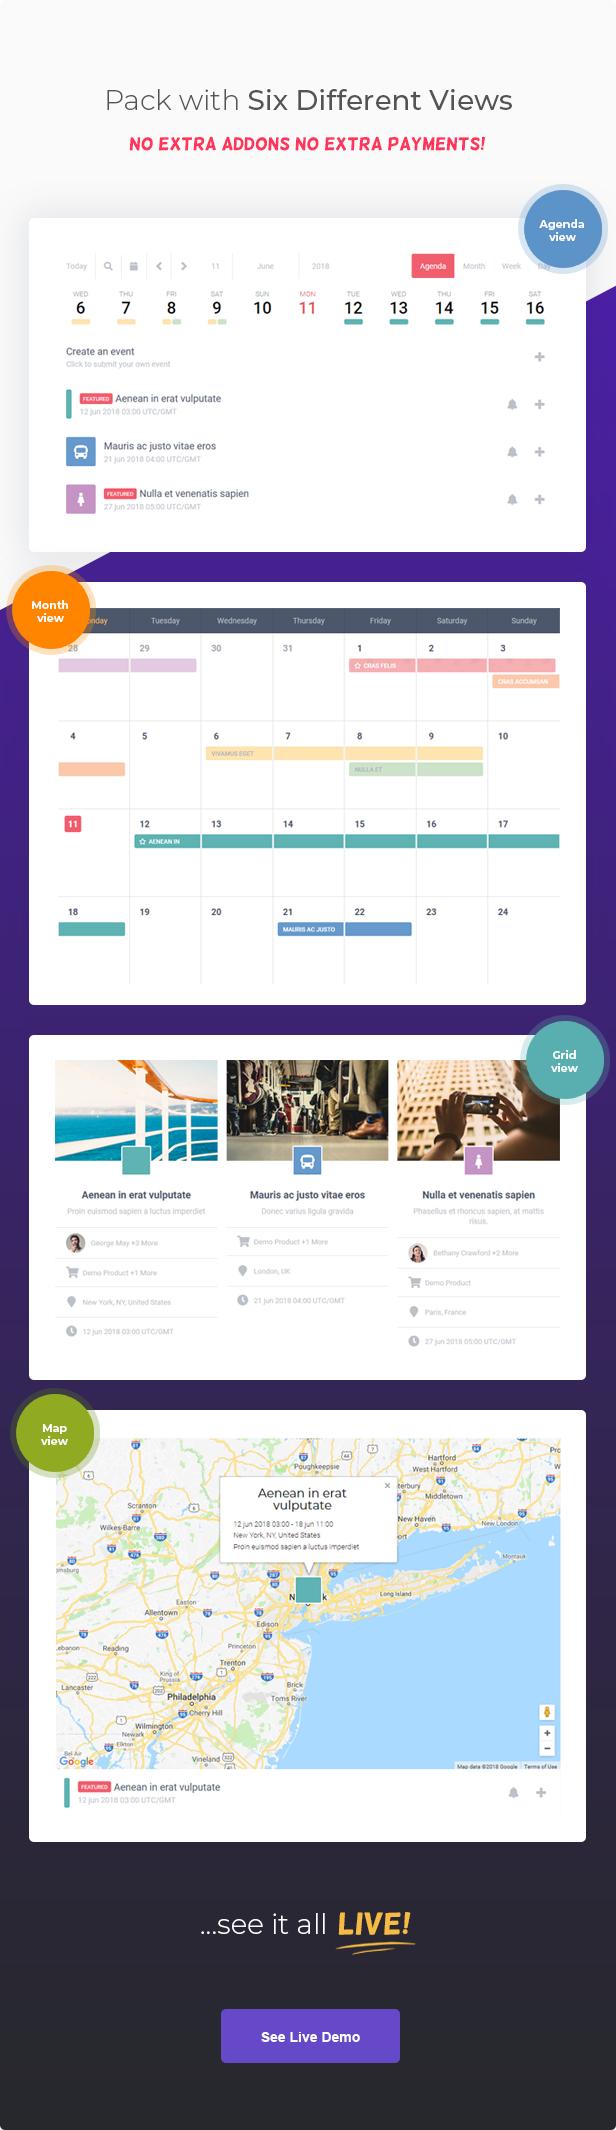 Stachethemes Event Calendar – WordPress Events Calendar within Stachethemes Event Calendar